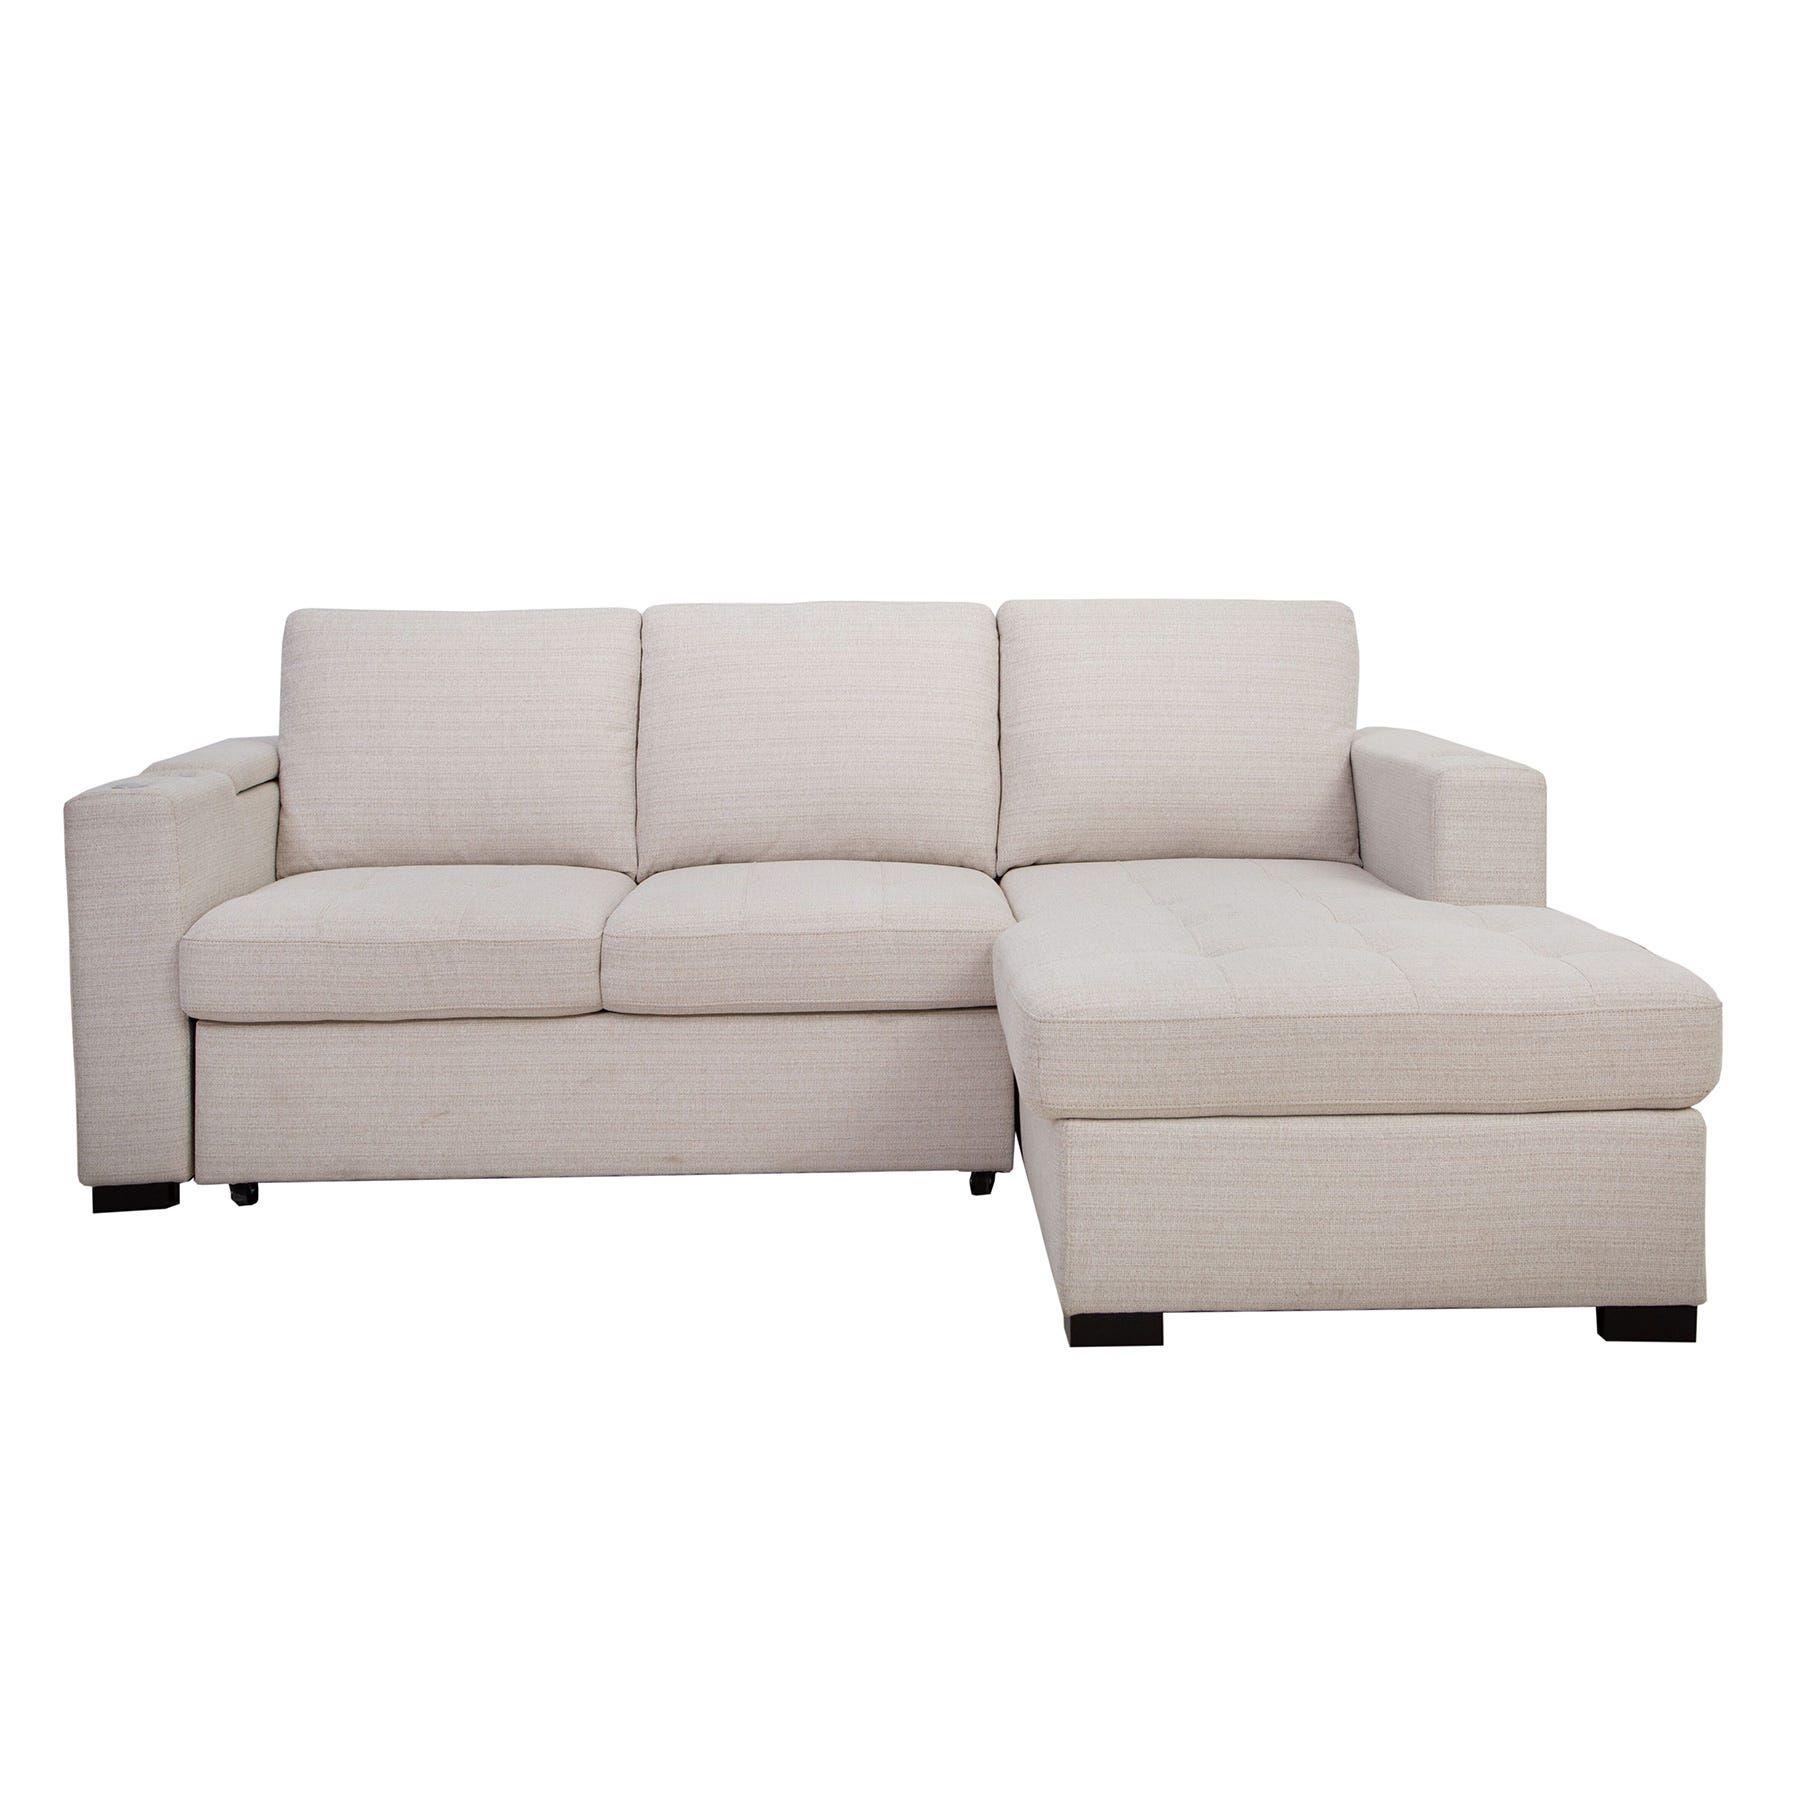 Luigi 2 Piece Cream Sleeper Sofa Chaise Weekends Only Furniture In 2020 Chaise Sofa Sleeper Sofa Chaise